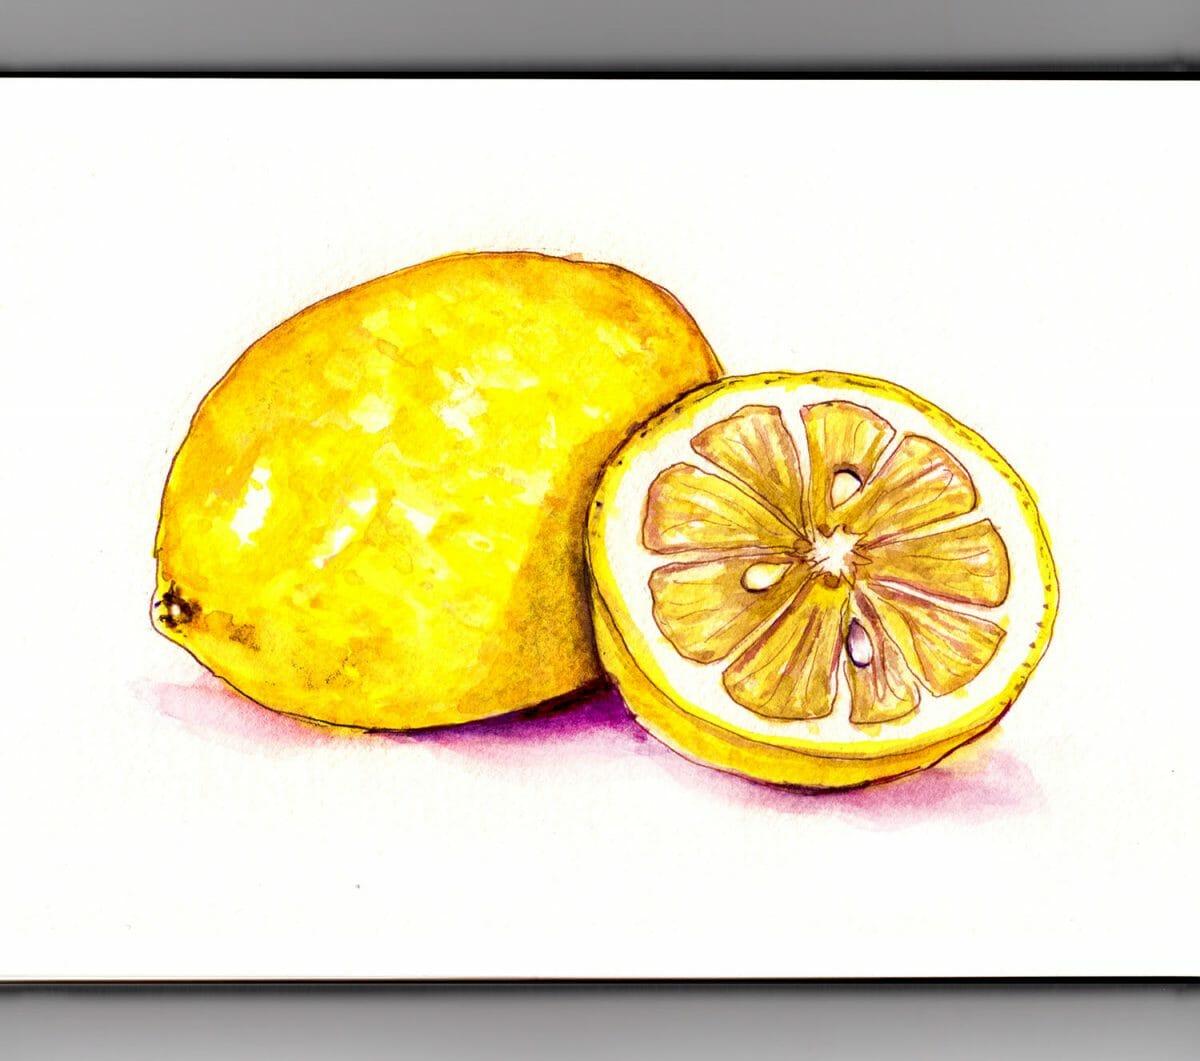 #WorldWatercolorGroup - Day 22 - A Bit Of Lemon - Doodlewash